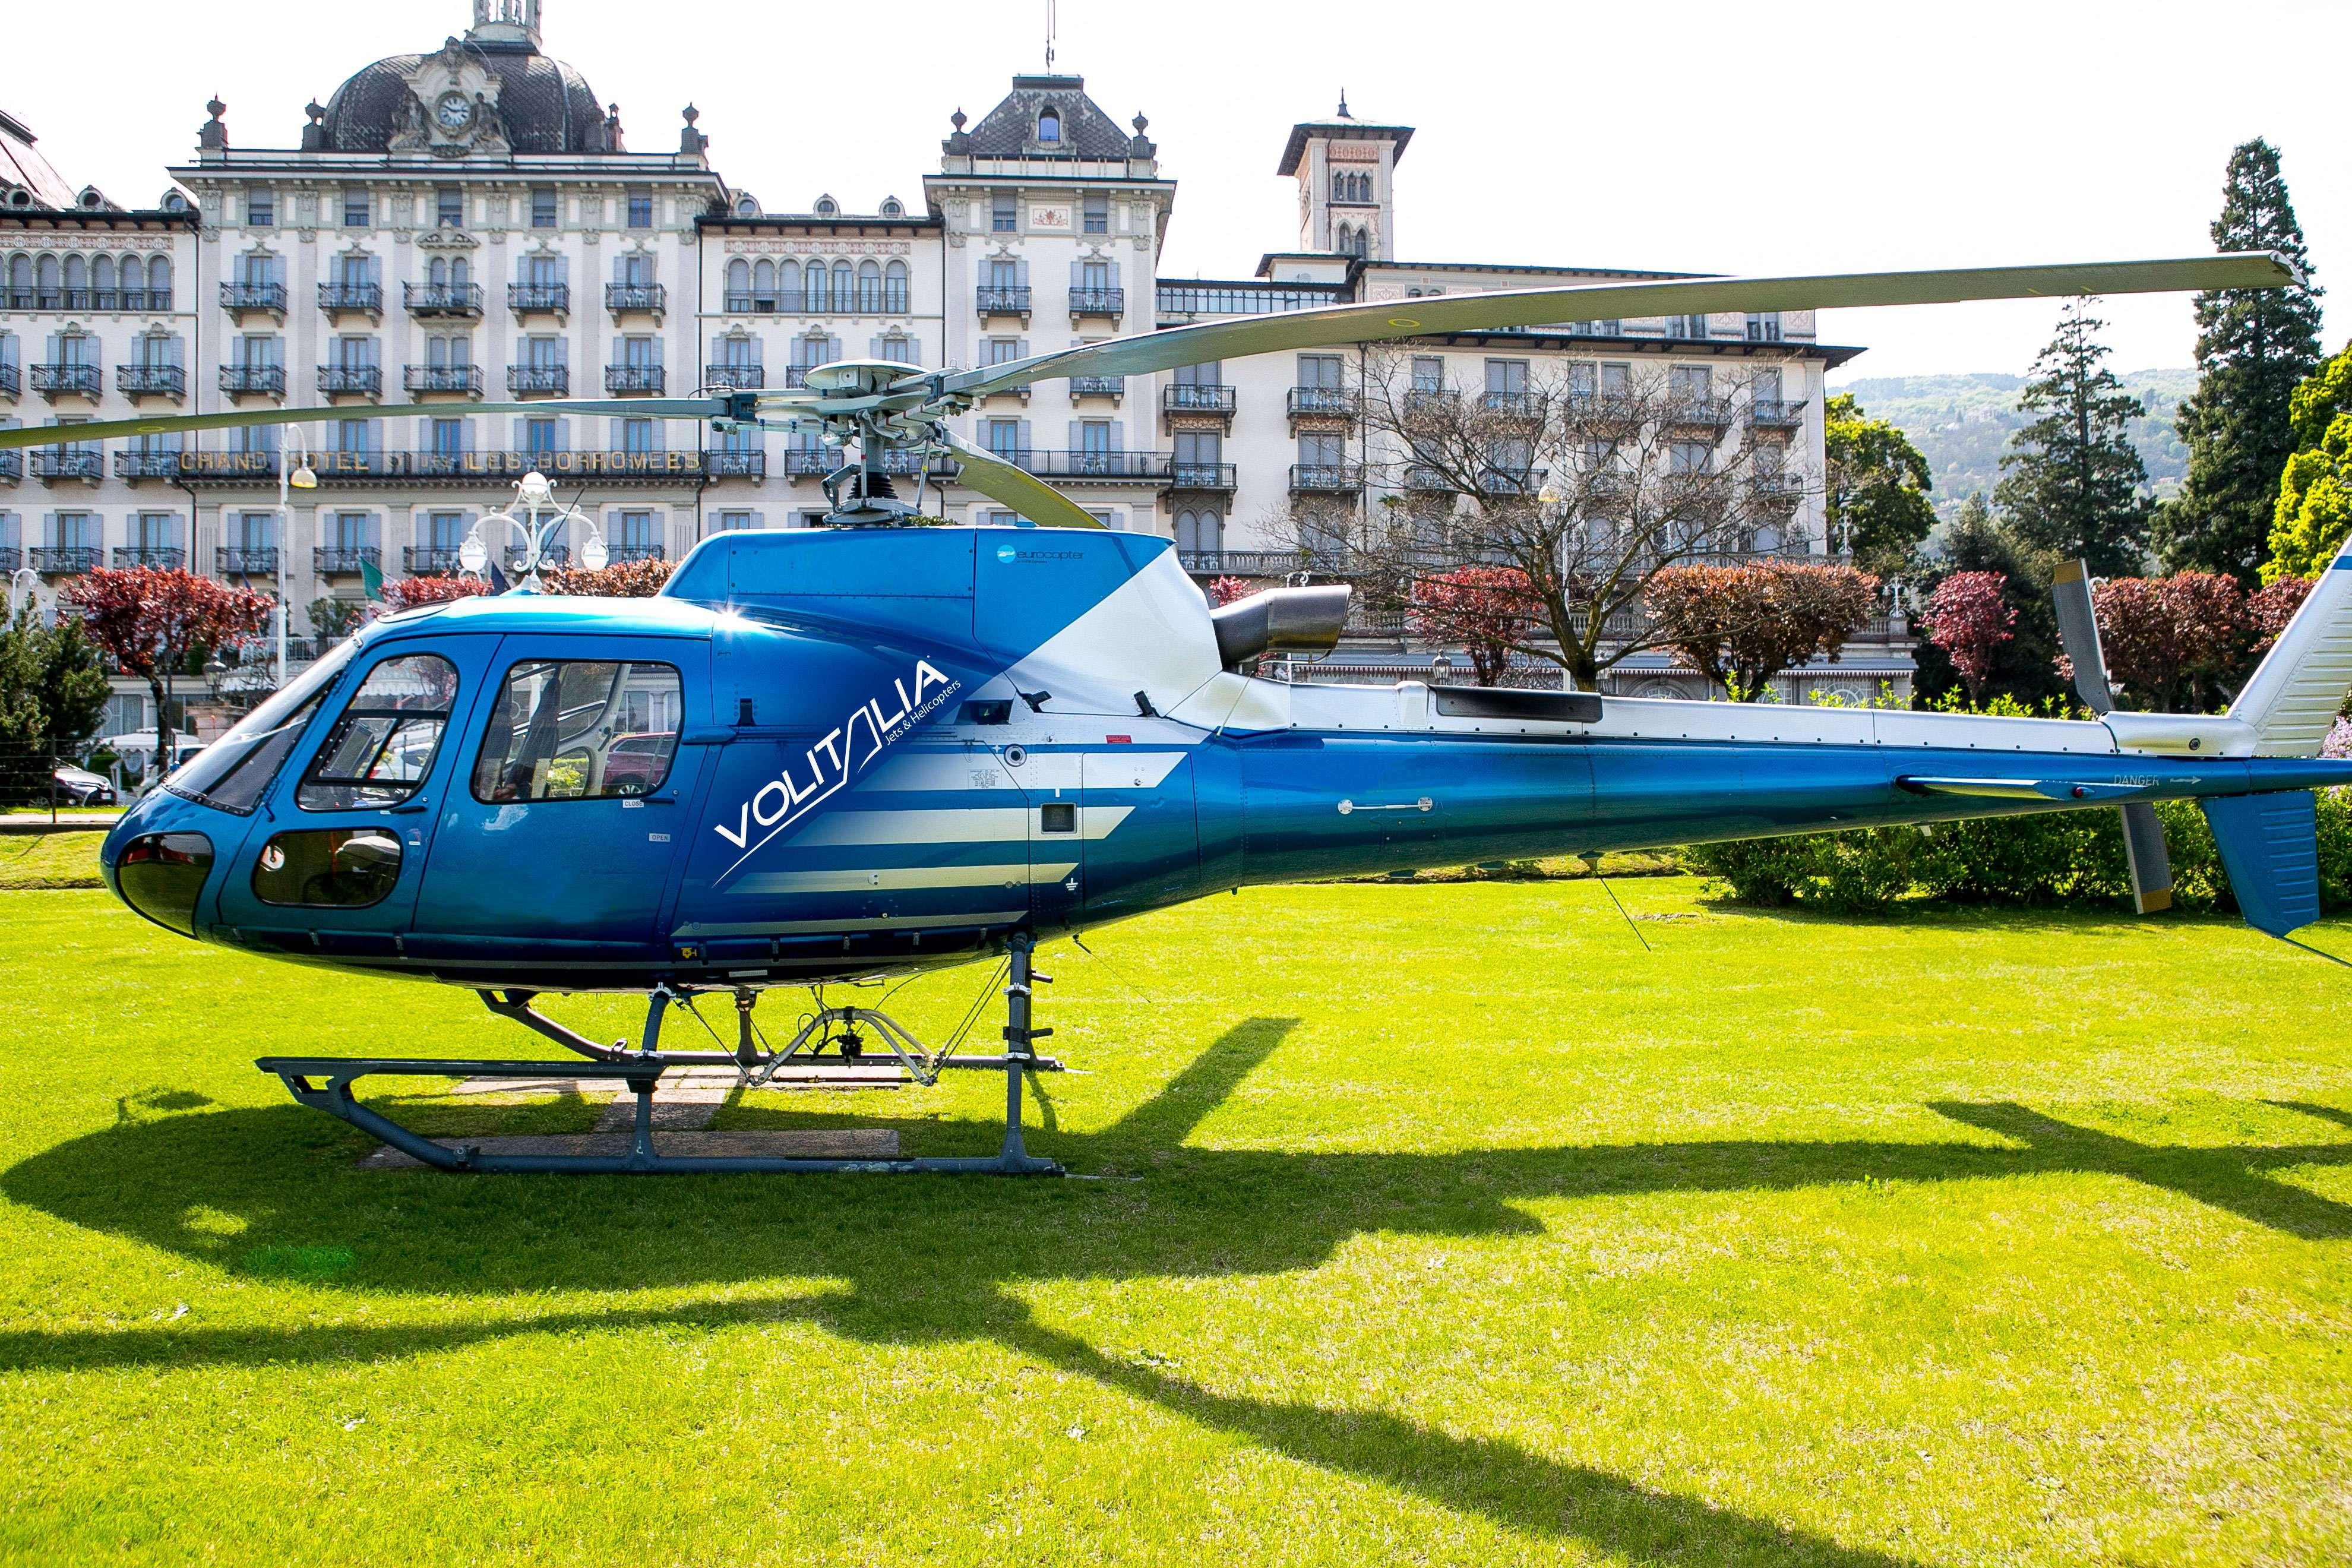 Elicottero Milano : Tour elicottero isole borromee lago maggiore milanoevents.it